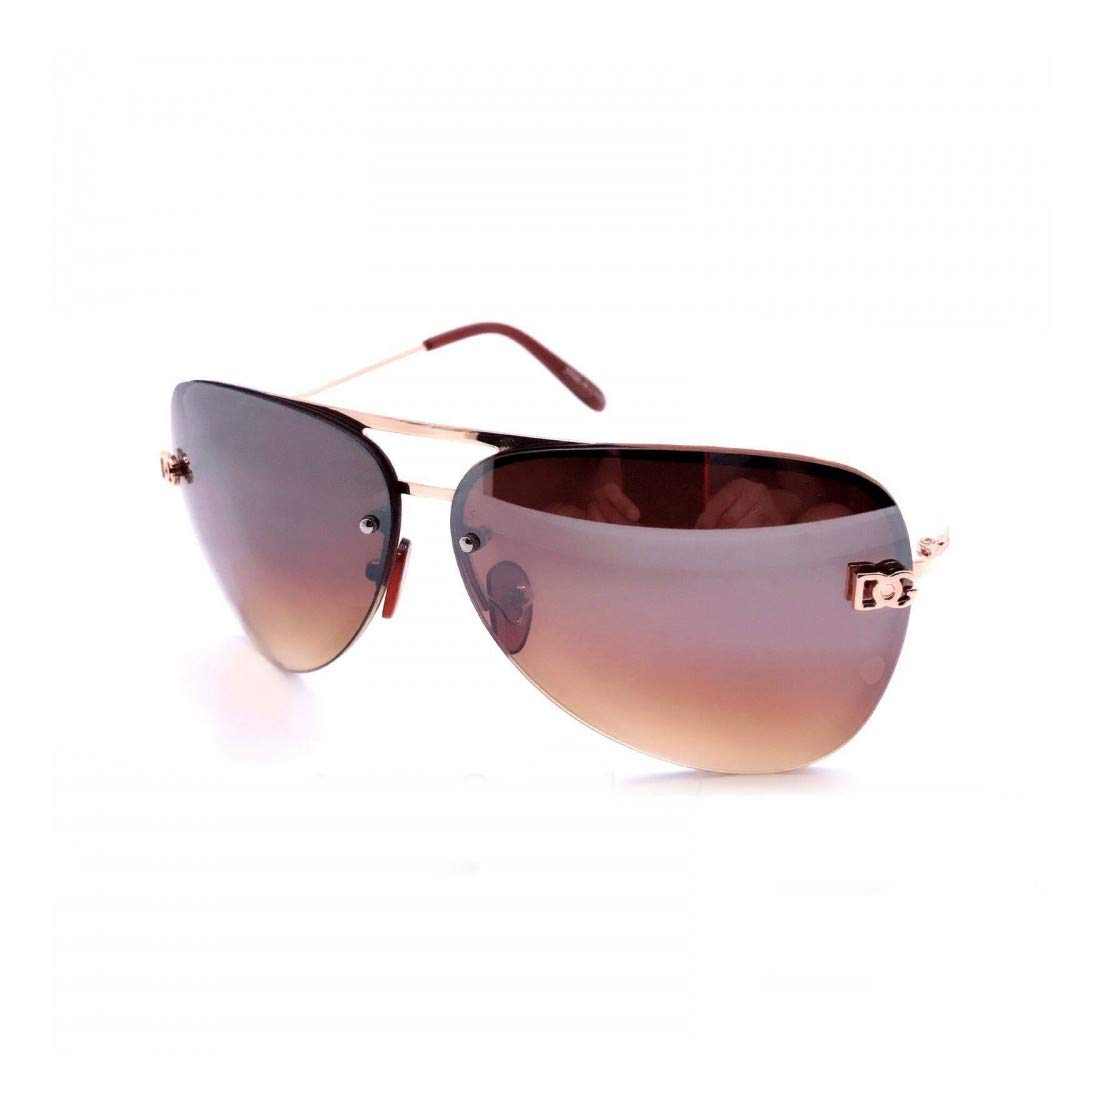 DG Aviator Fashion Designer Sunglasses Shades Mens Women Retro #117